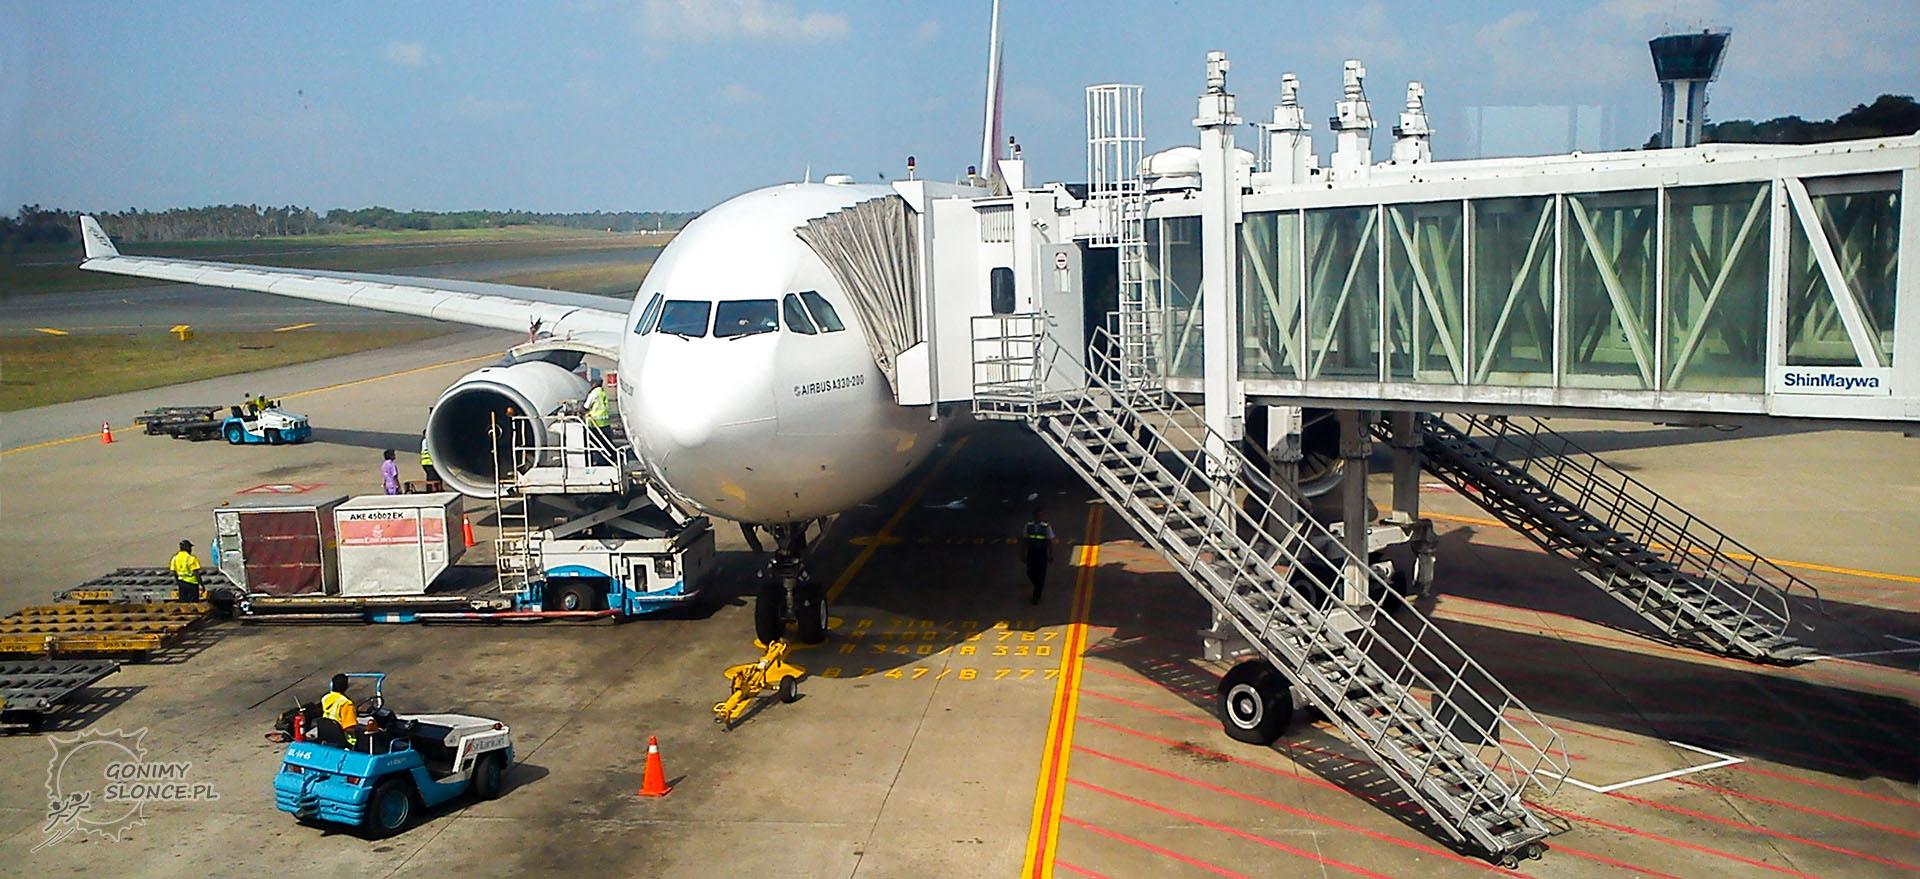 Dubaj lotnisko, samolot